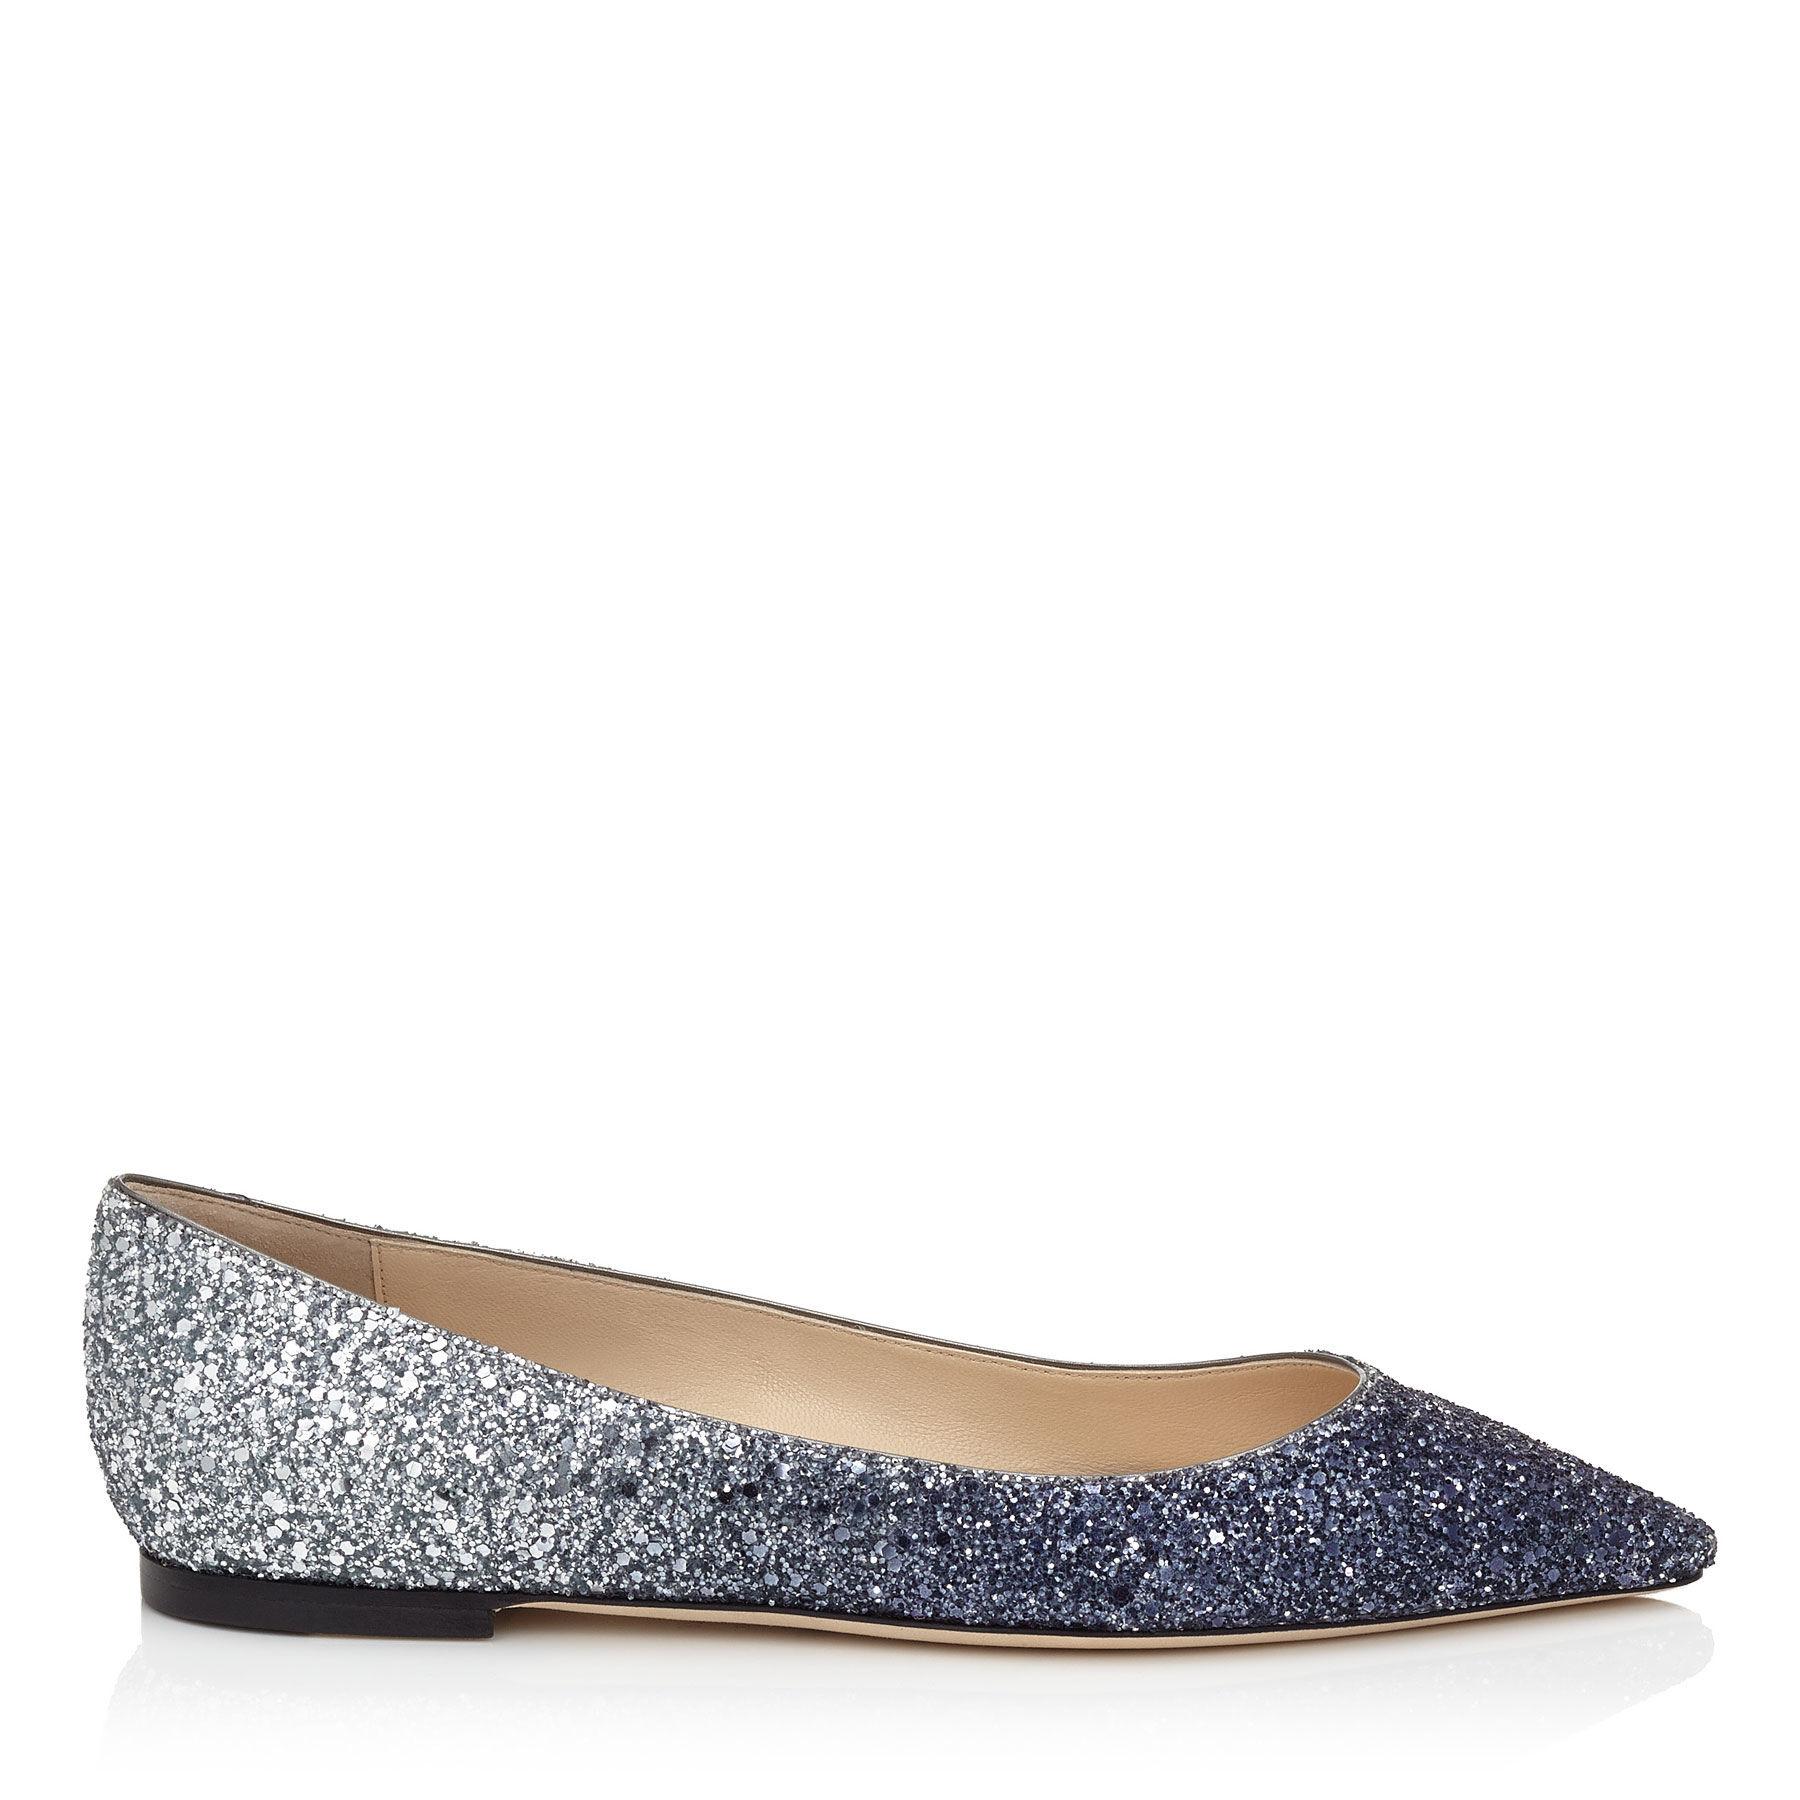 Blue Flat Shoes Uk